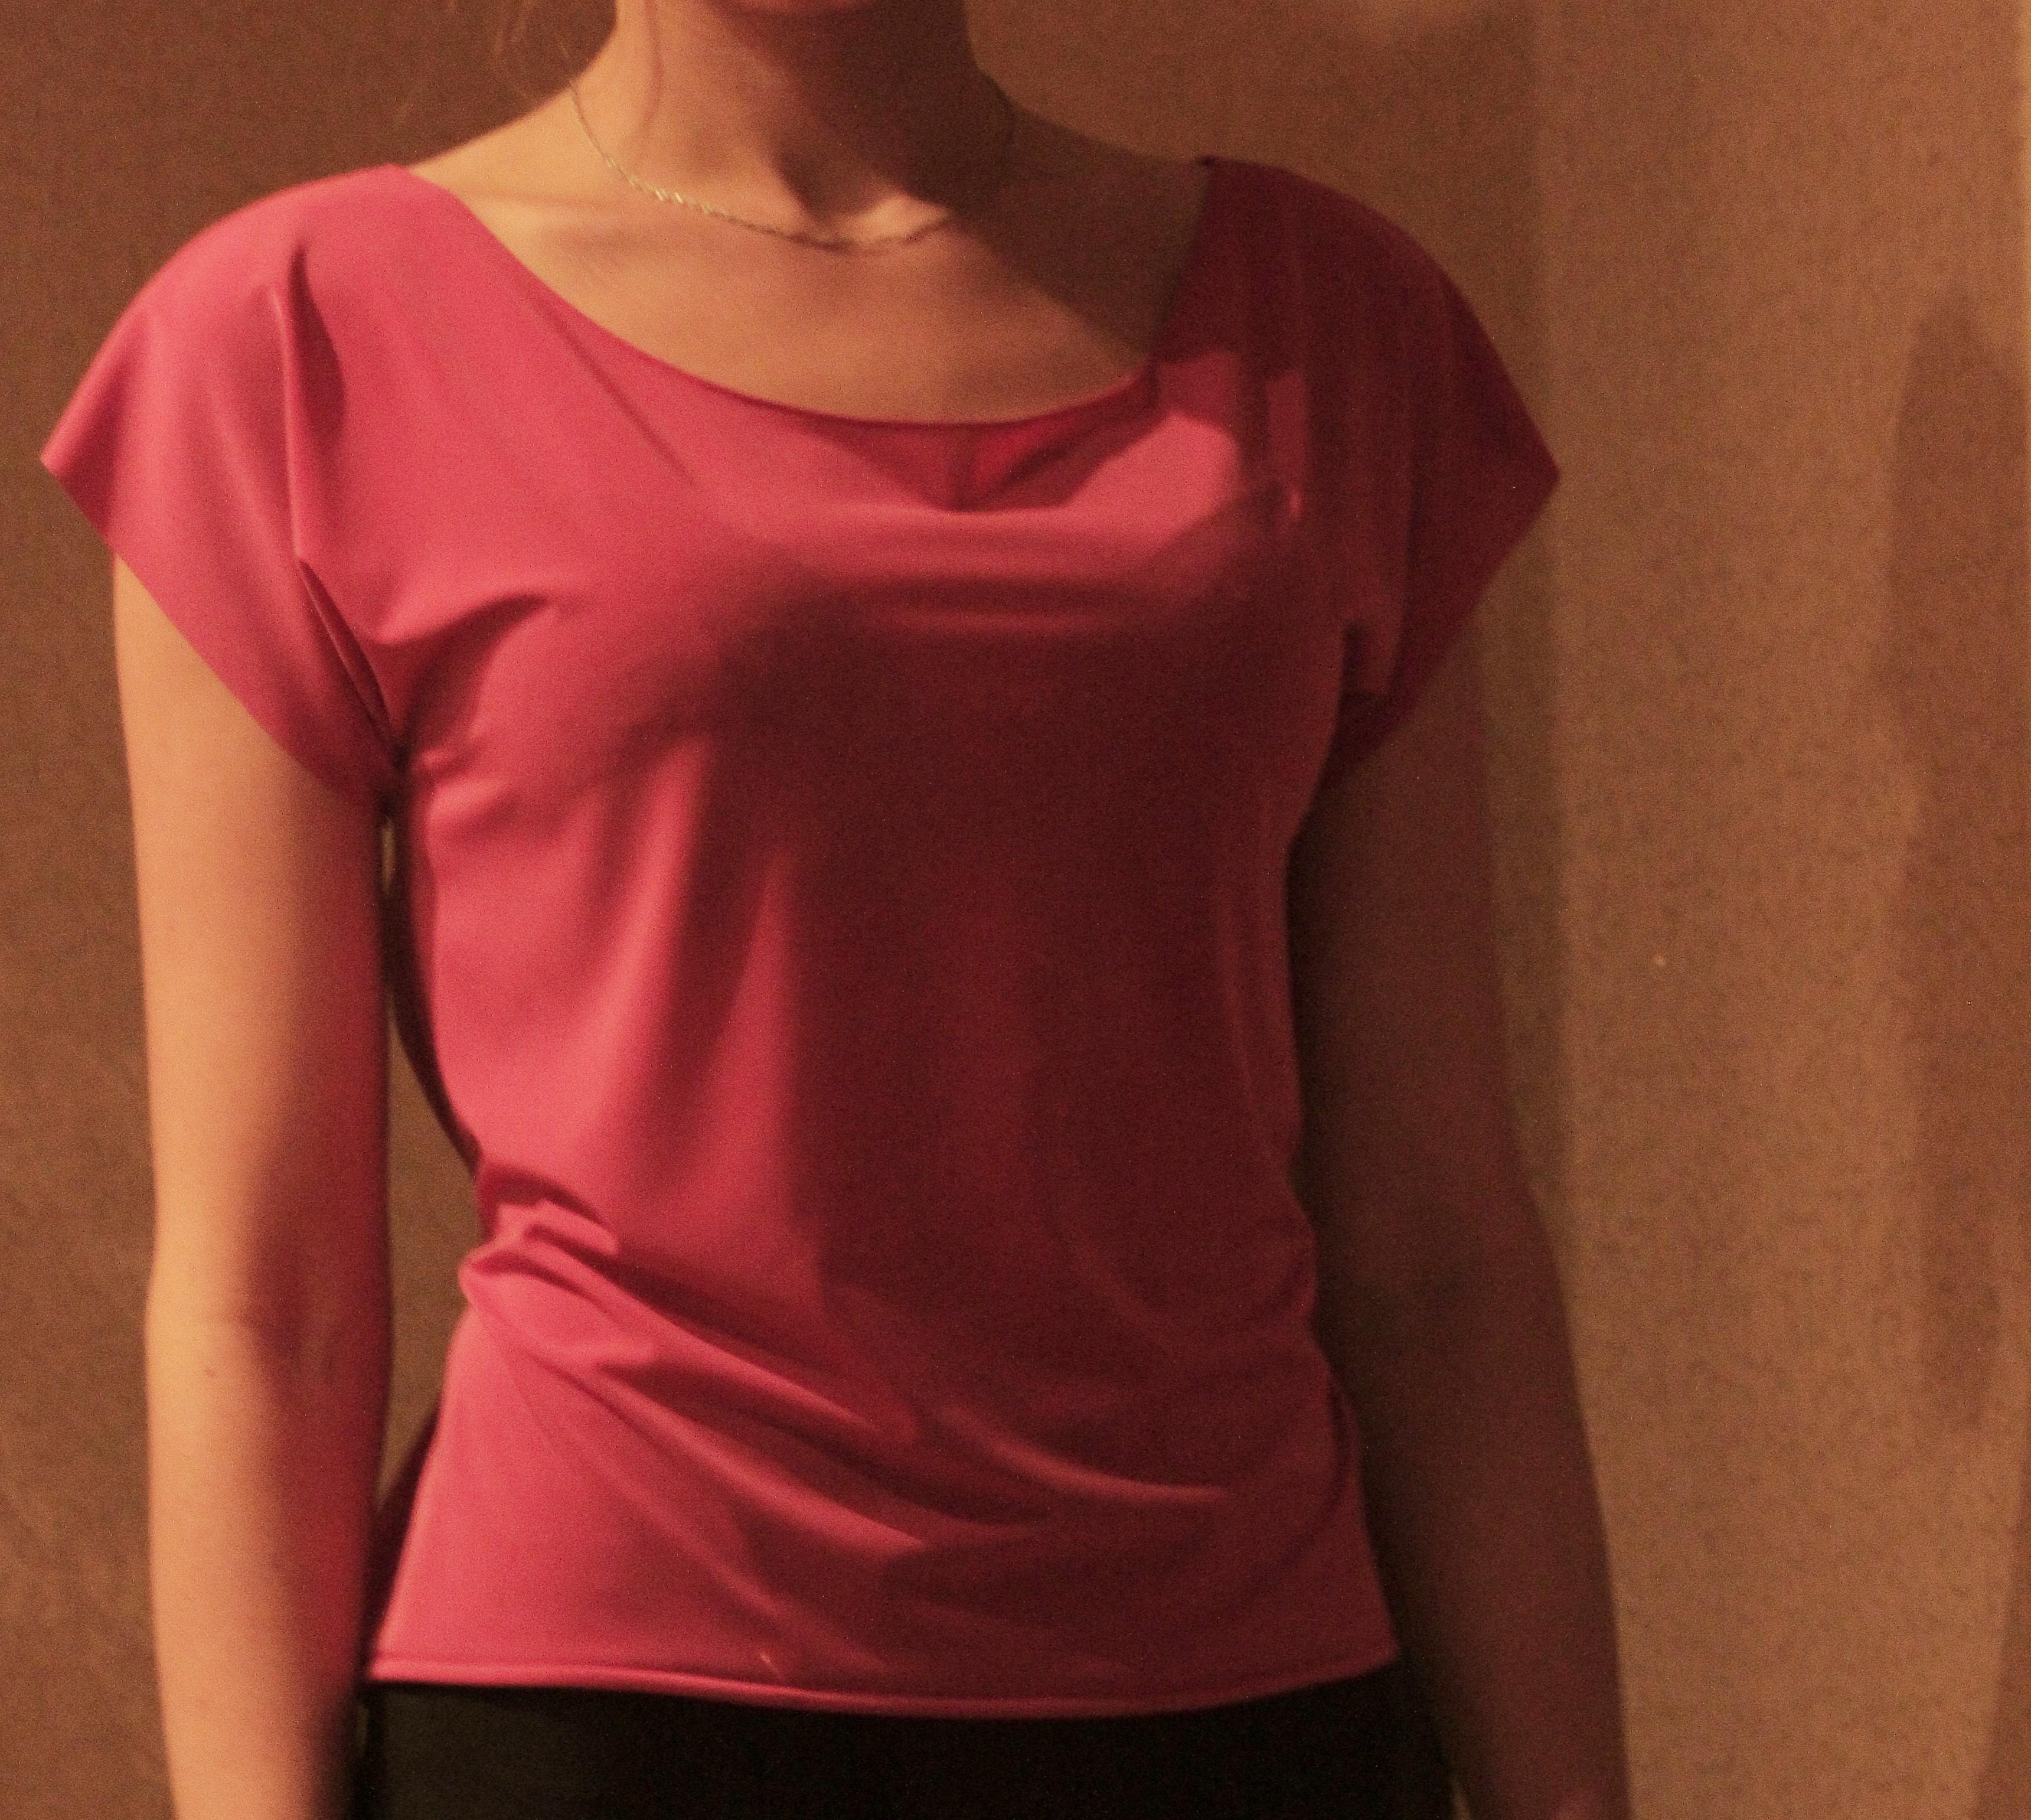 Блузка на резинке своими руками фото 97